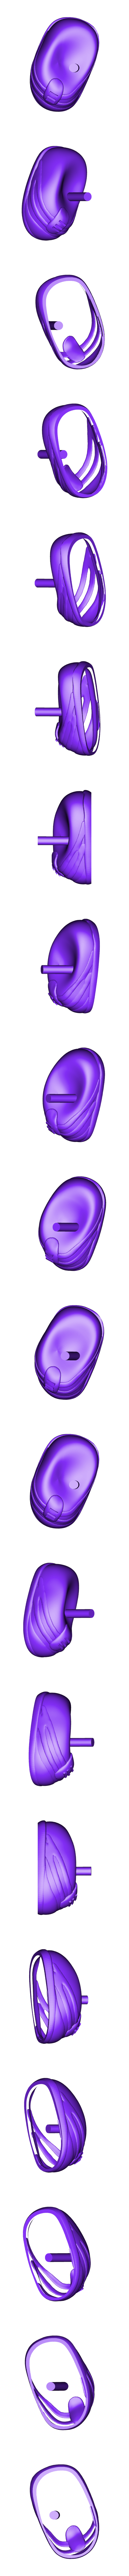 right_shoe.stl Download free STL file Mr. Potato Head [Toy Story] • 3D printer template, Dream_it_Model_it